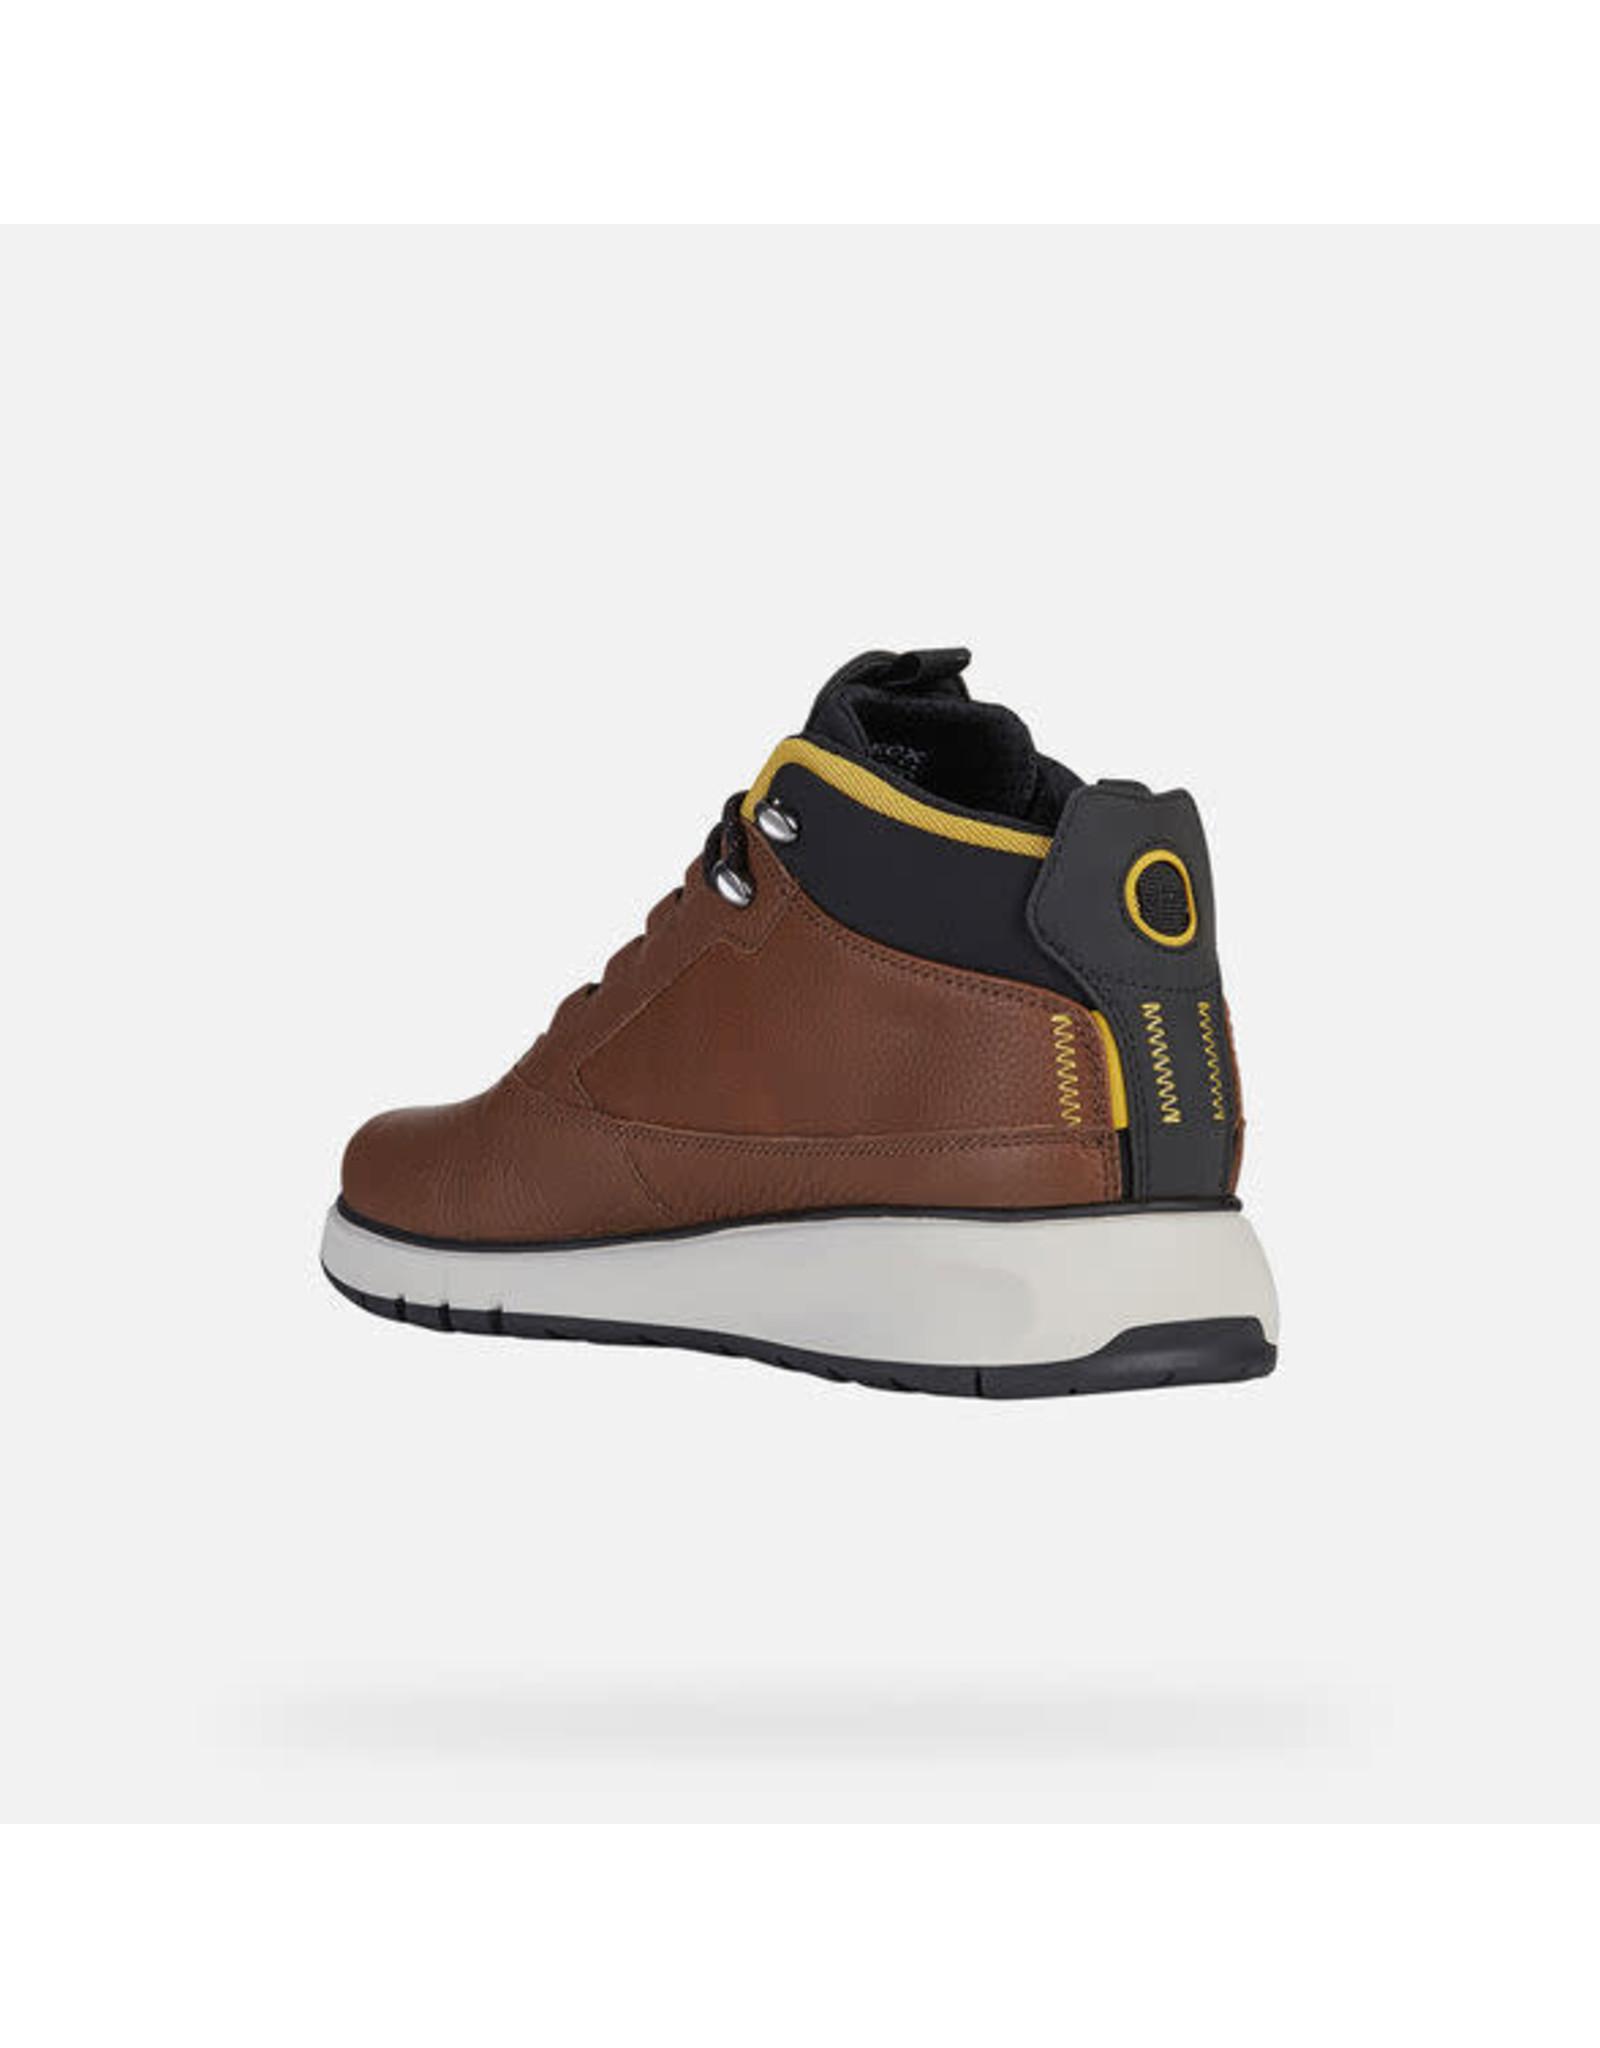 Geox Aerantis C Tan Boot